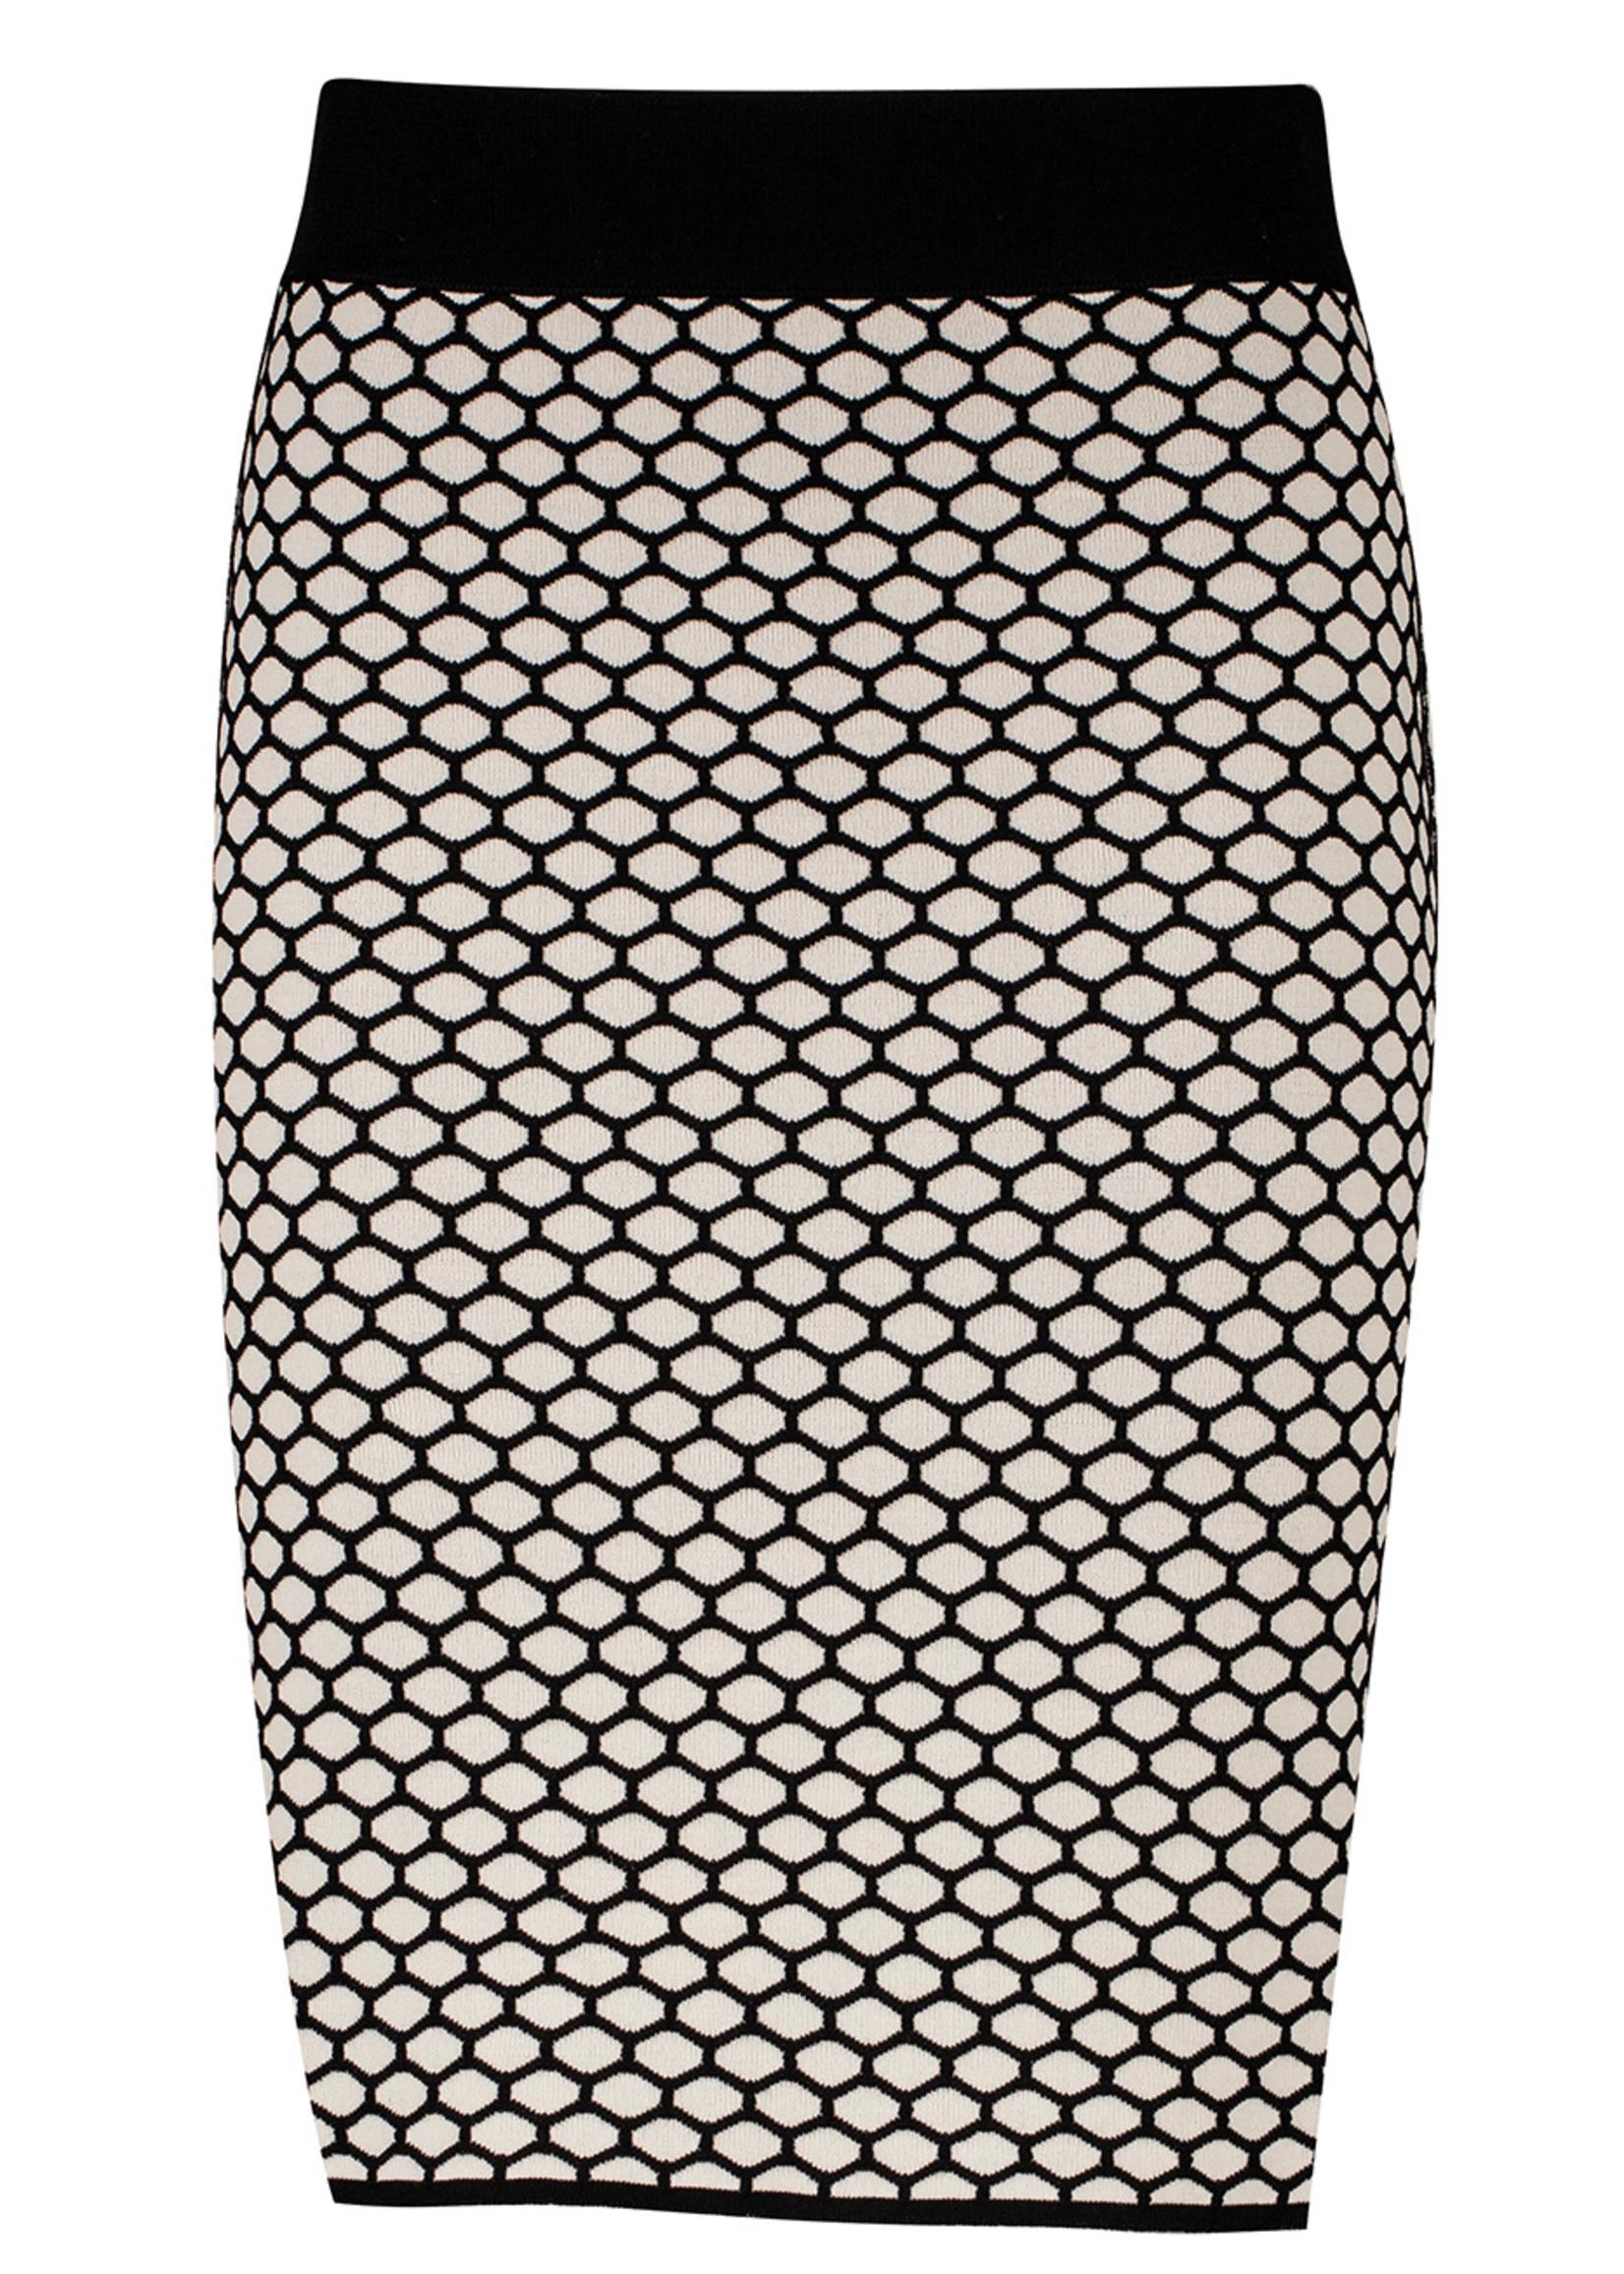 Zilch Zilch Reversible Honeycomb Knit Skirt